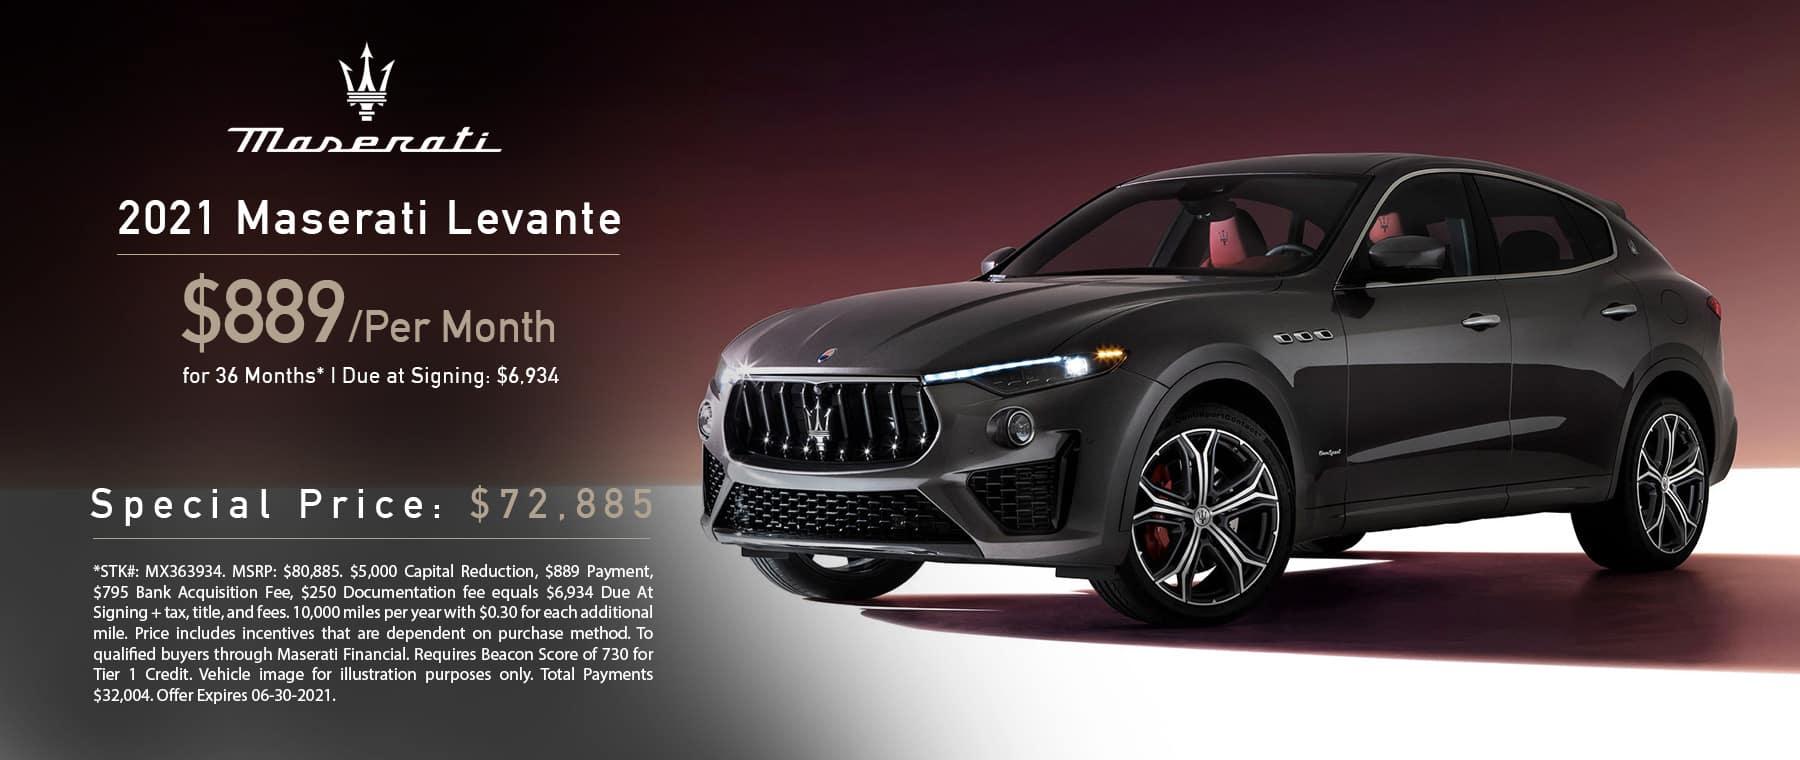 Maserati_2020_Levante_Slide_June2021_1